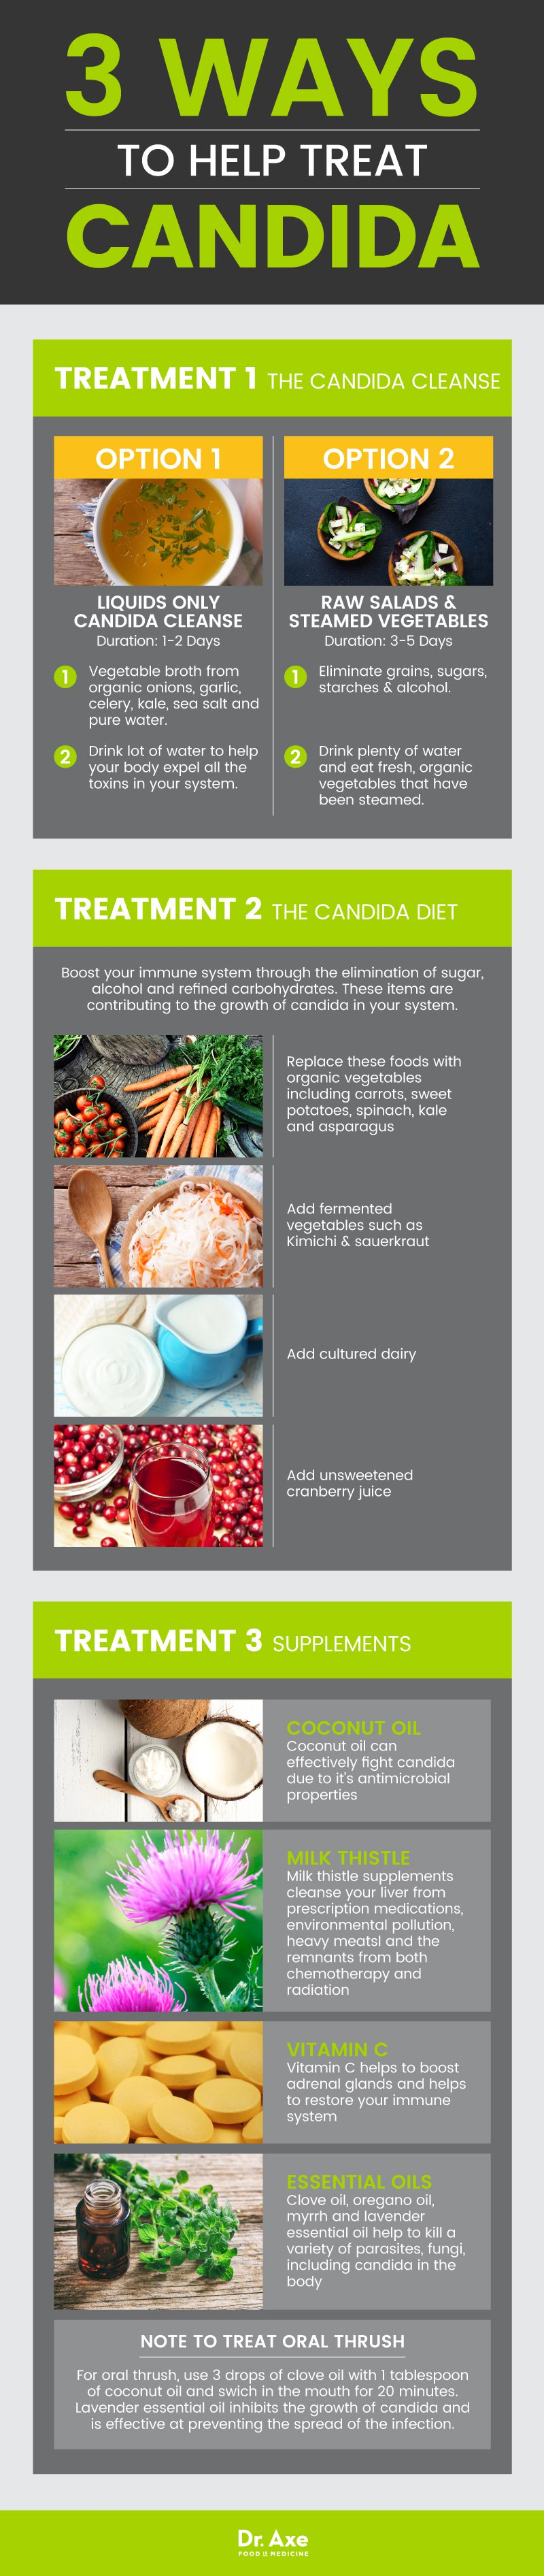 Ways to help treat Candida